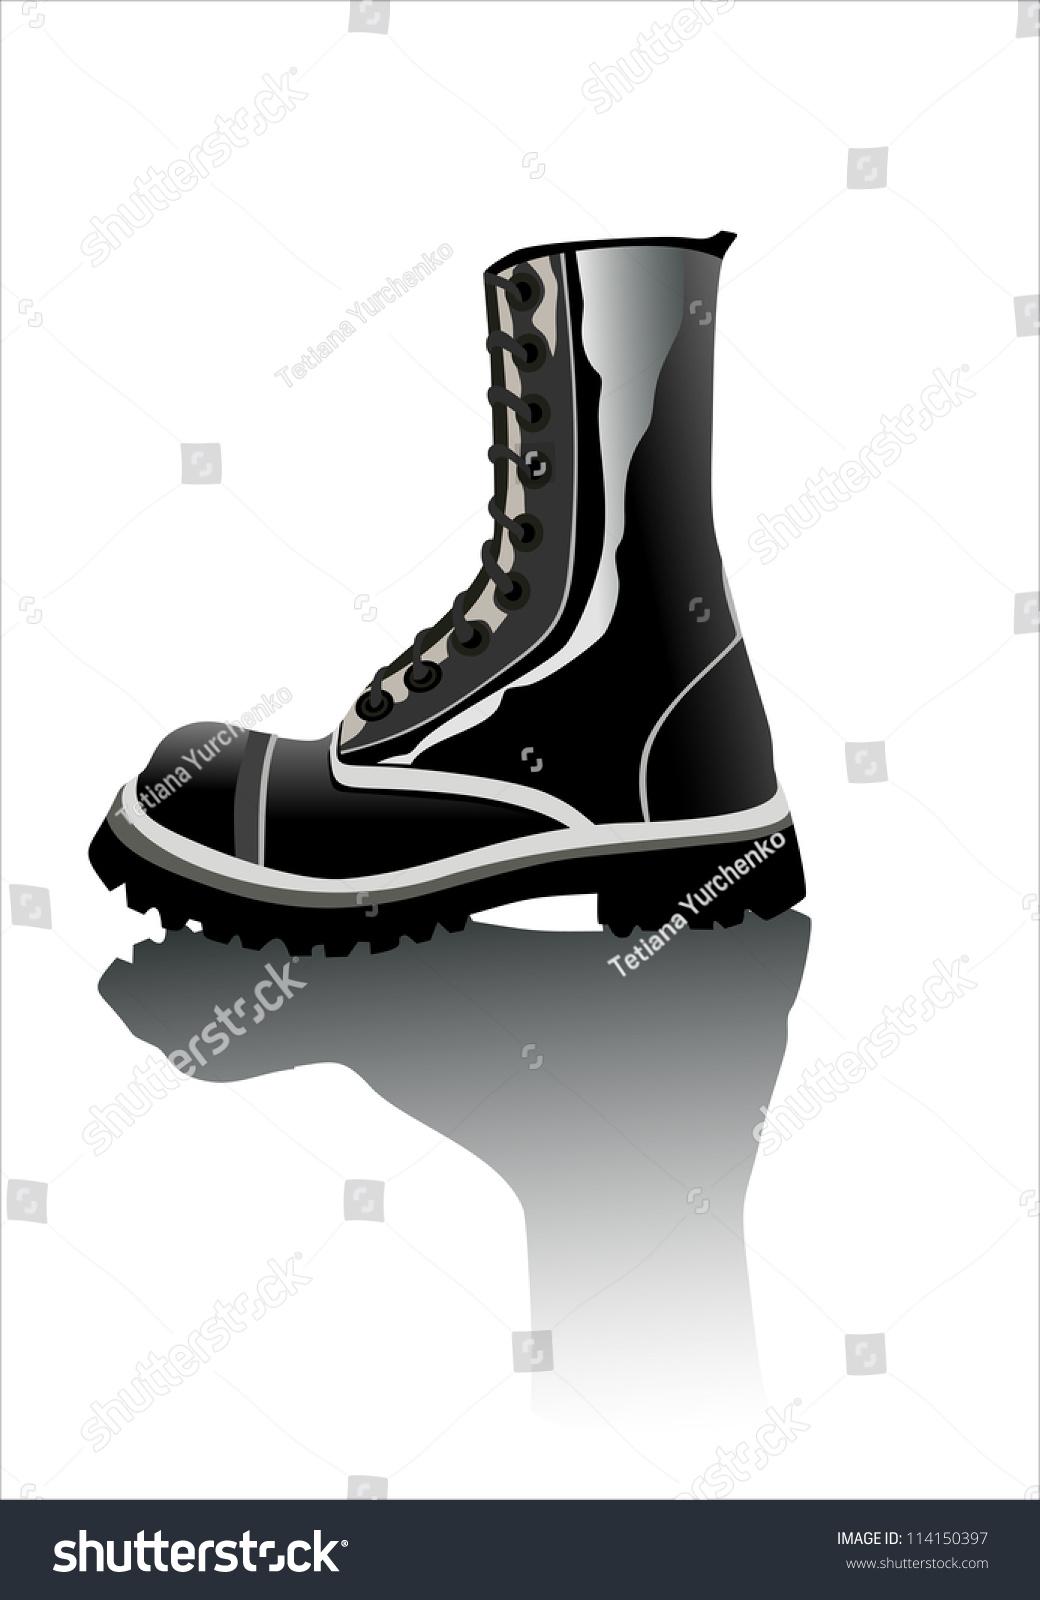 Black Army Boot Stock Vector Illustration 114150397  Shutterstock